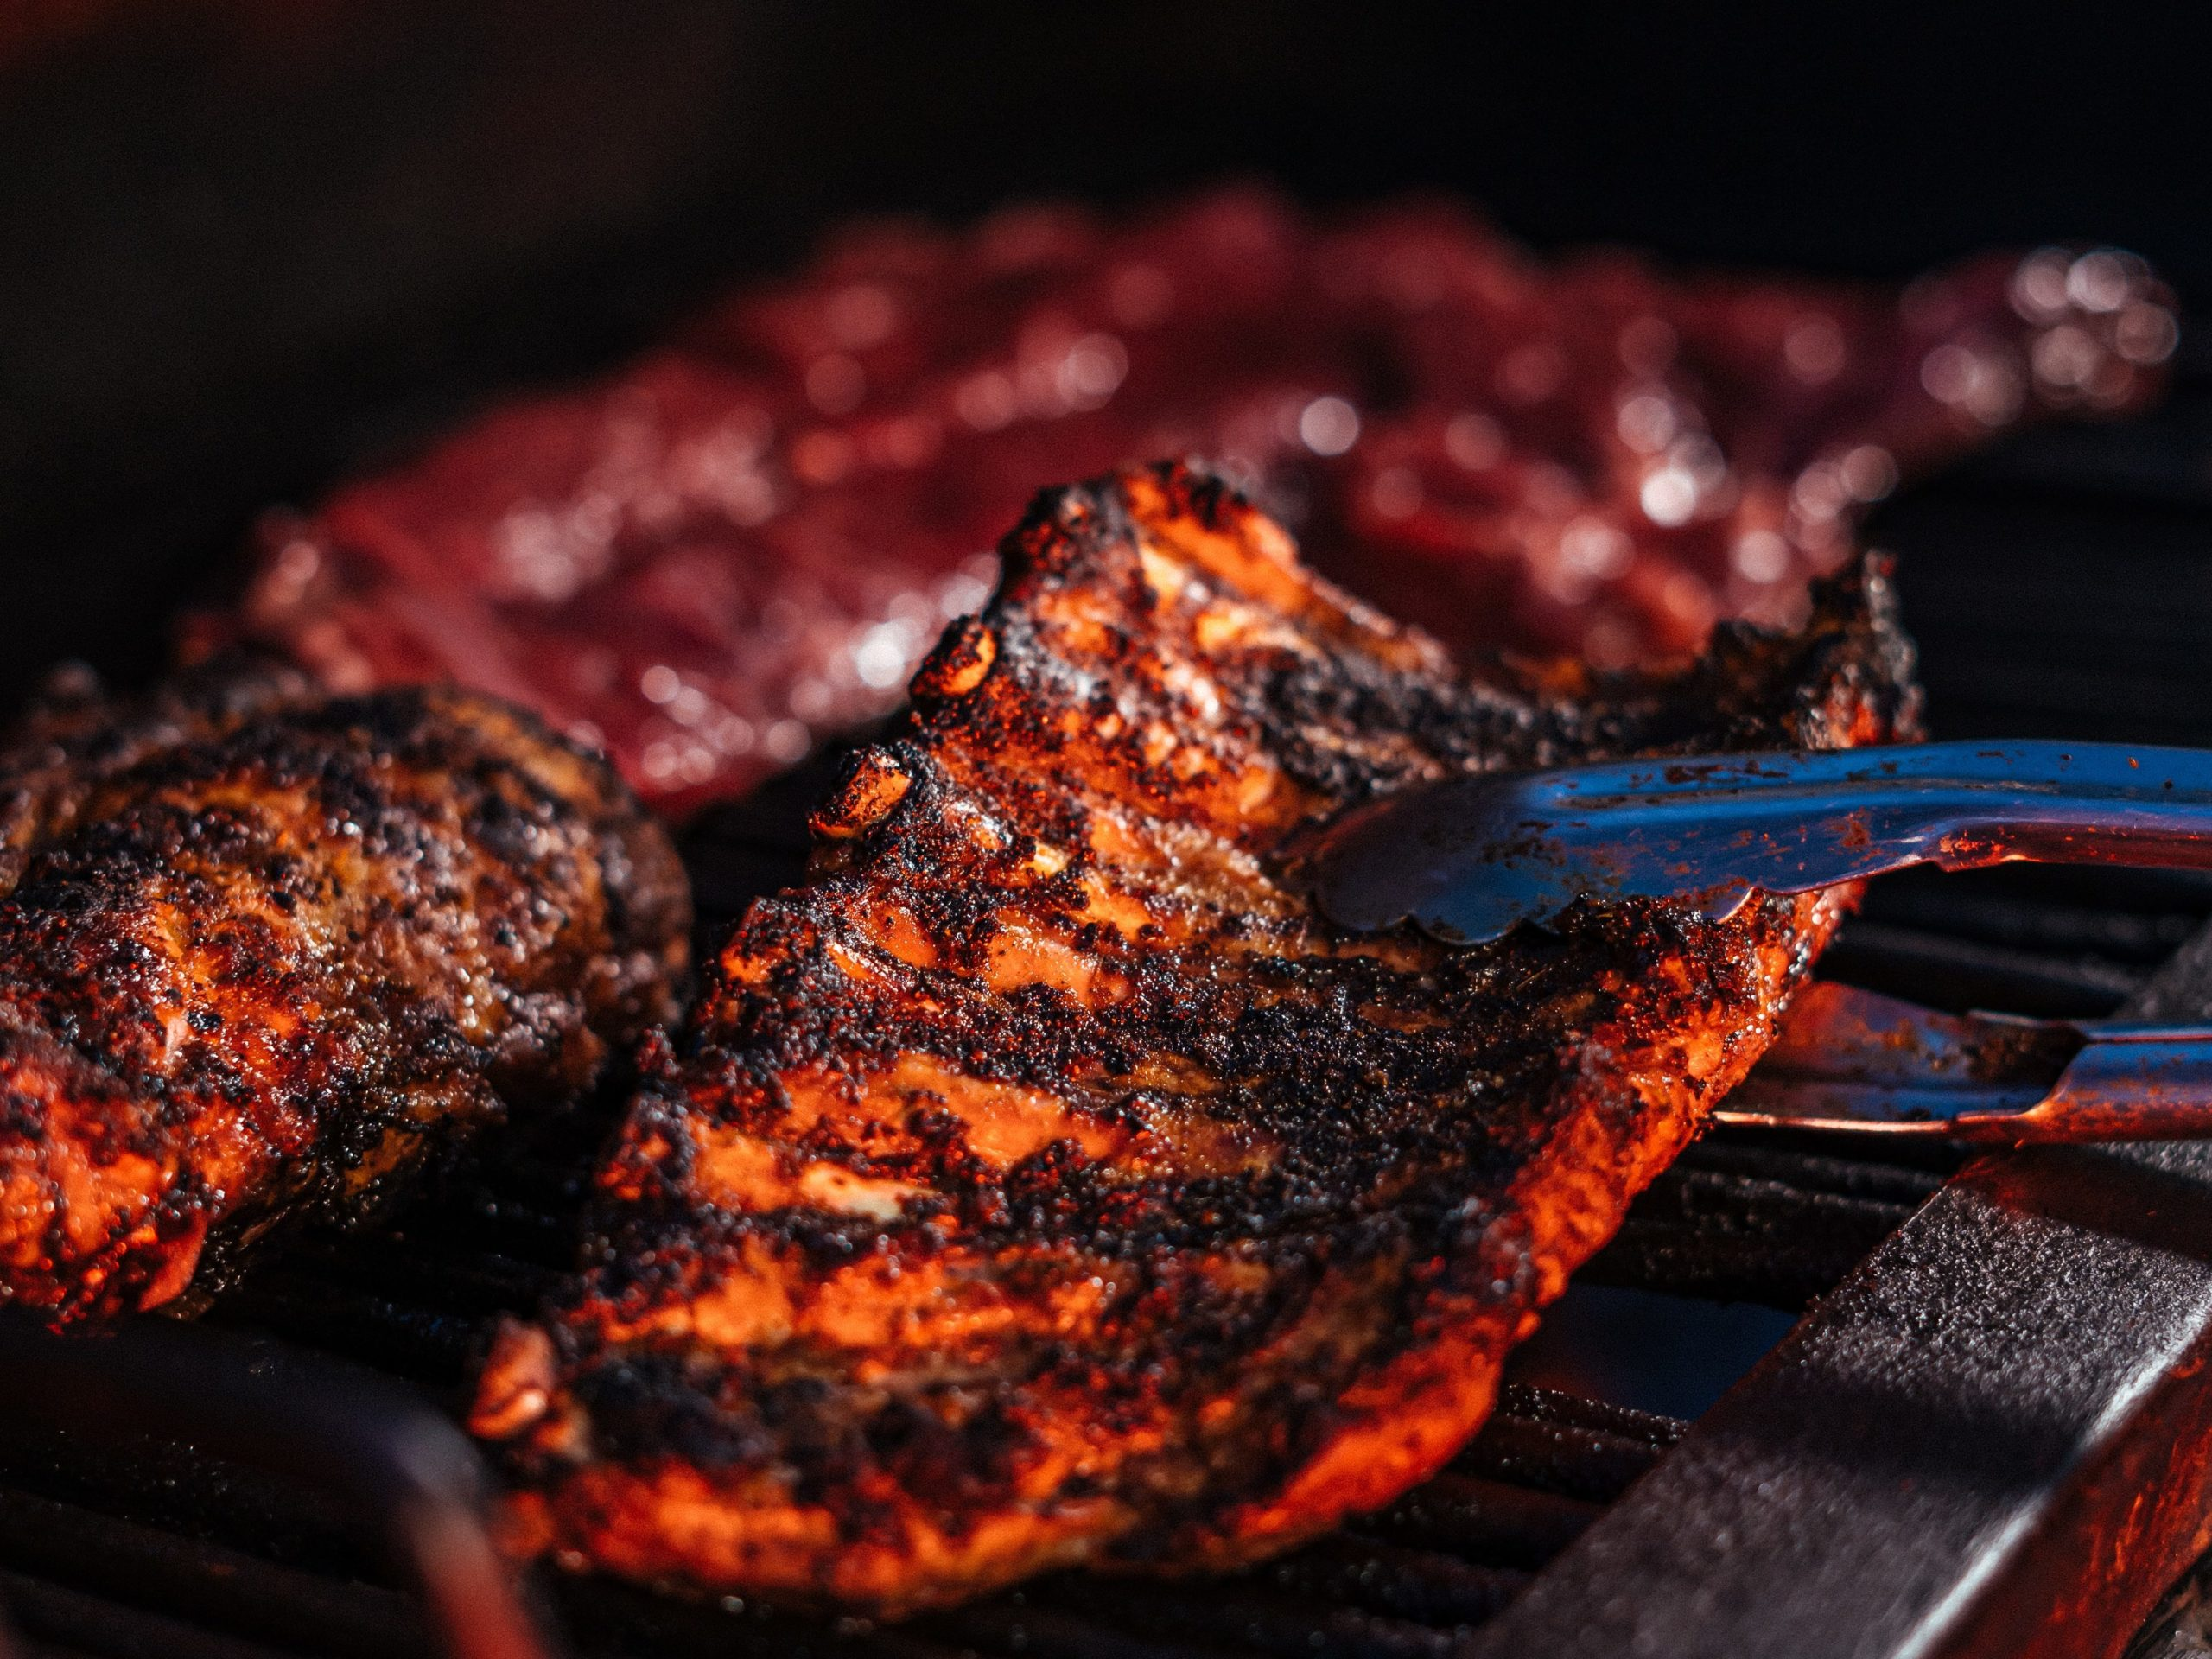 accord met vin porc grill barbecue